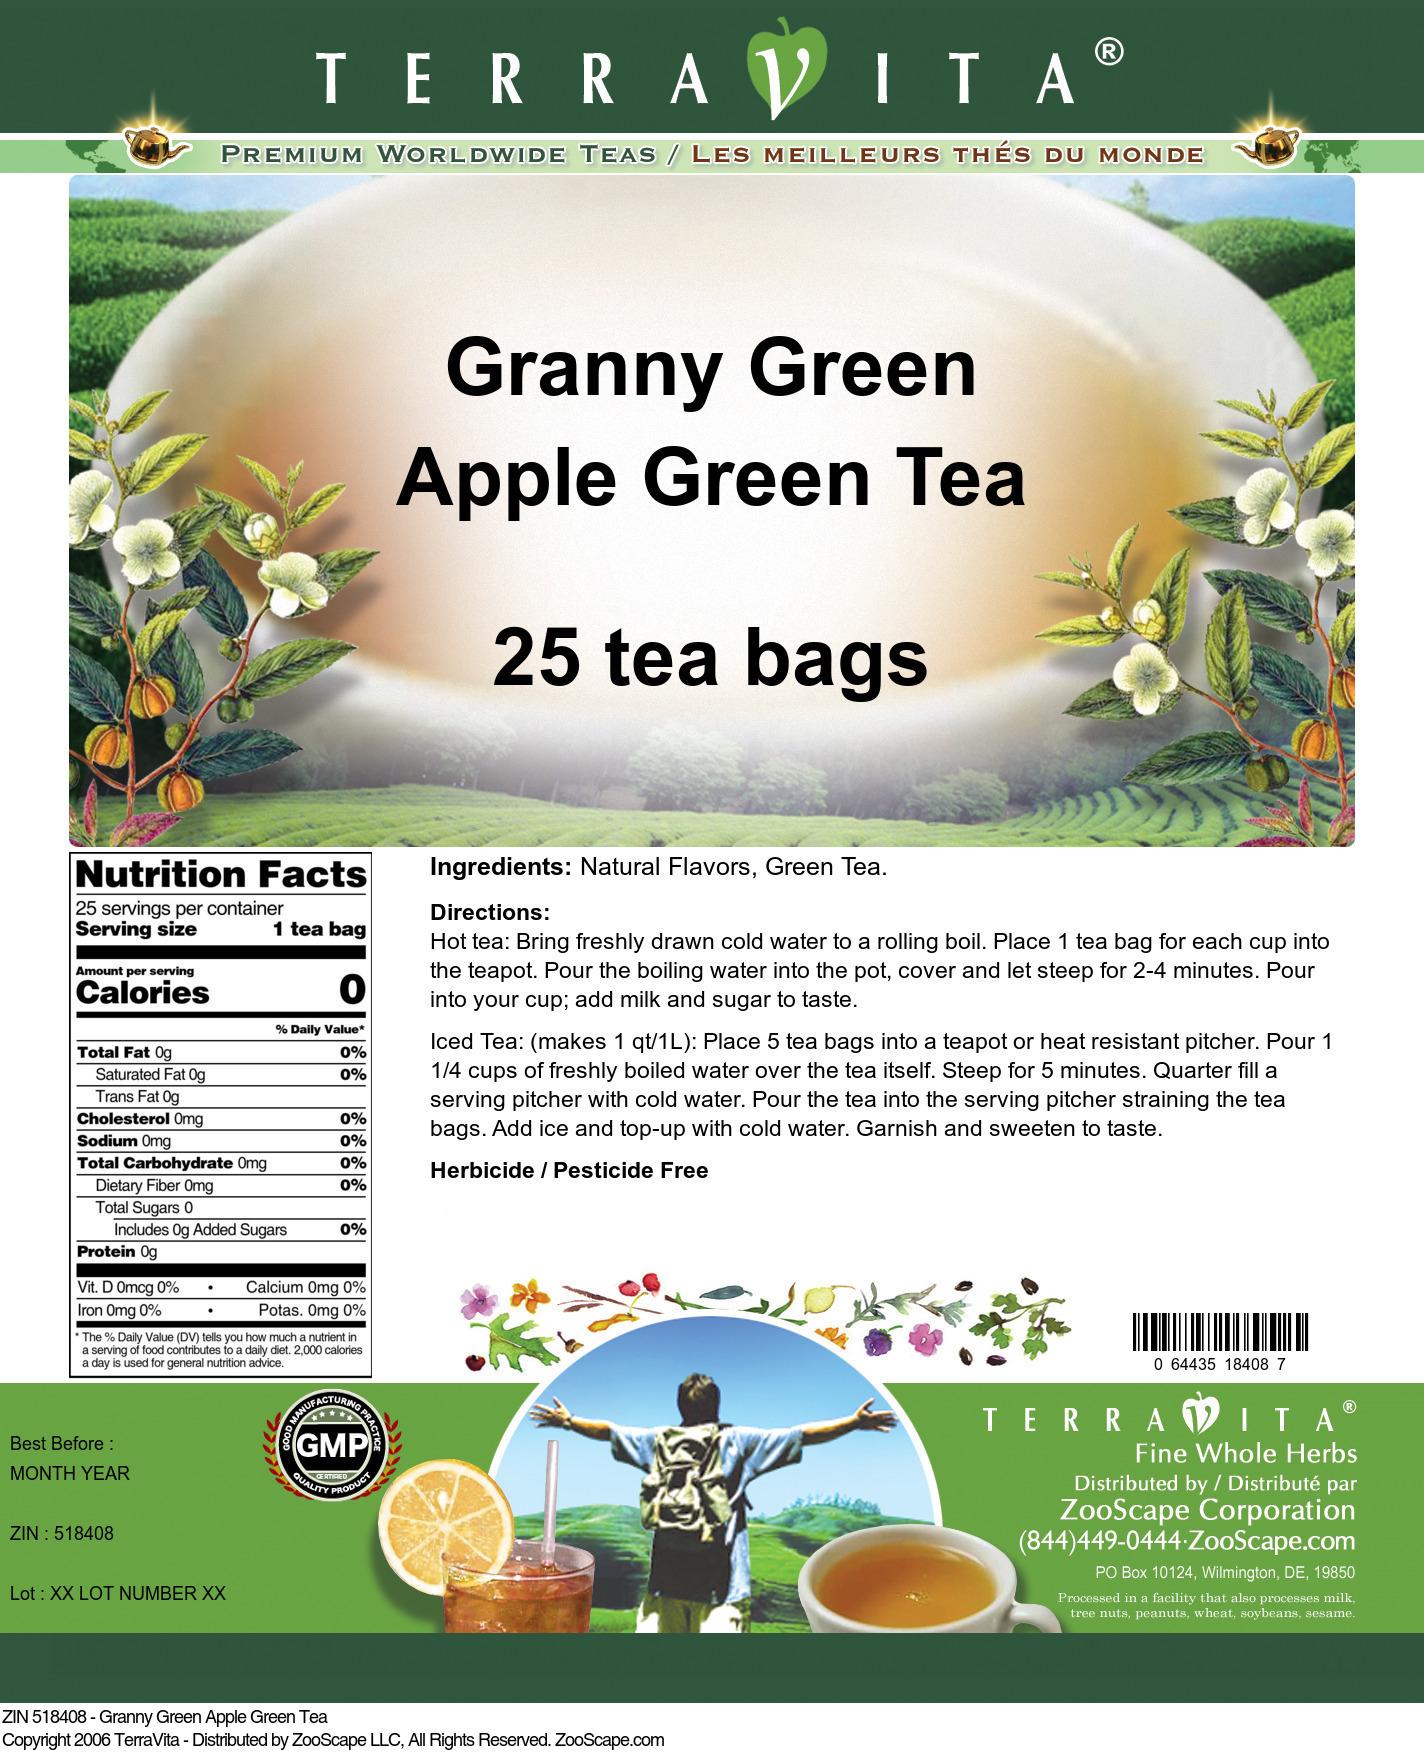 Granny Green Apple Green Tea